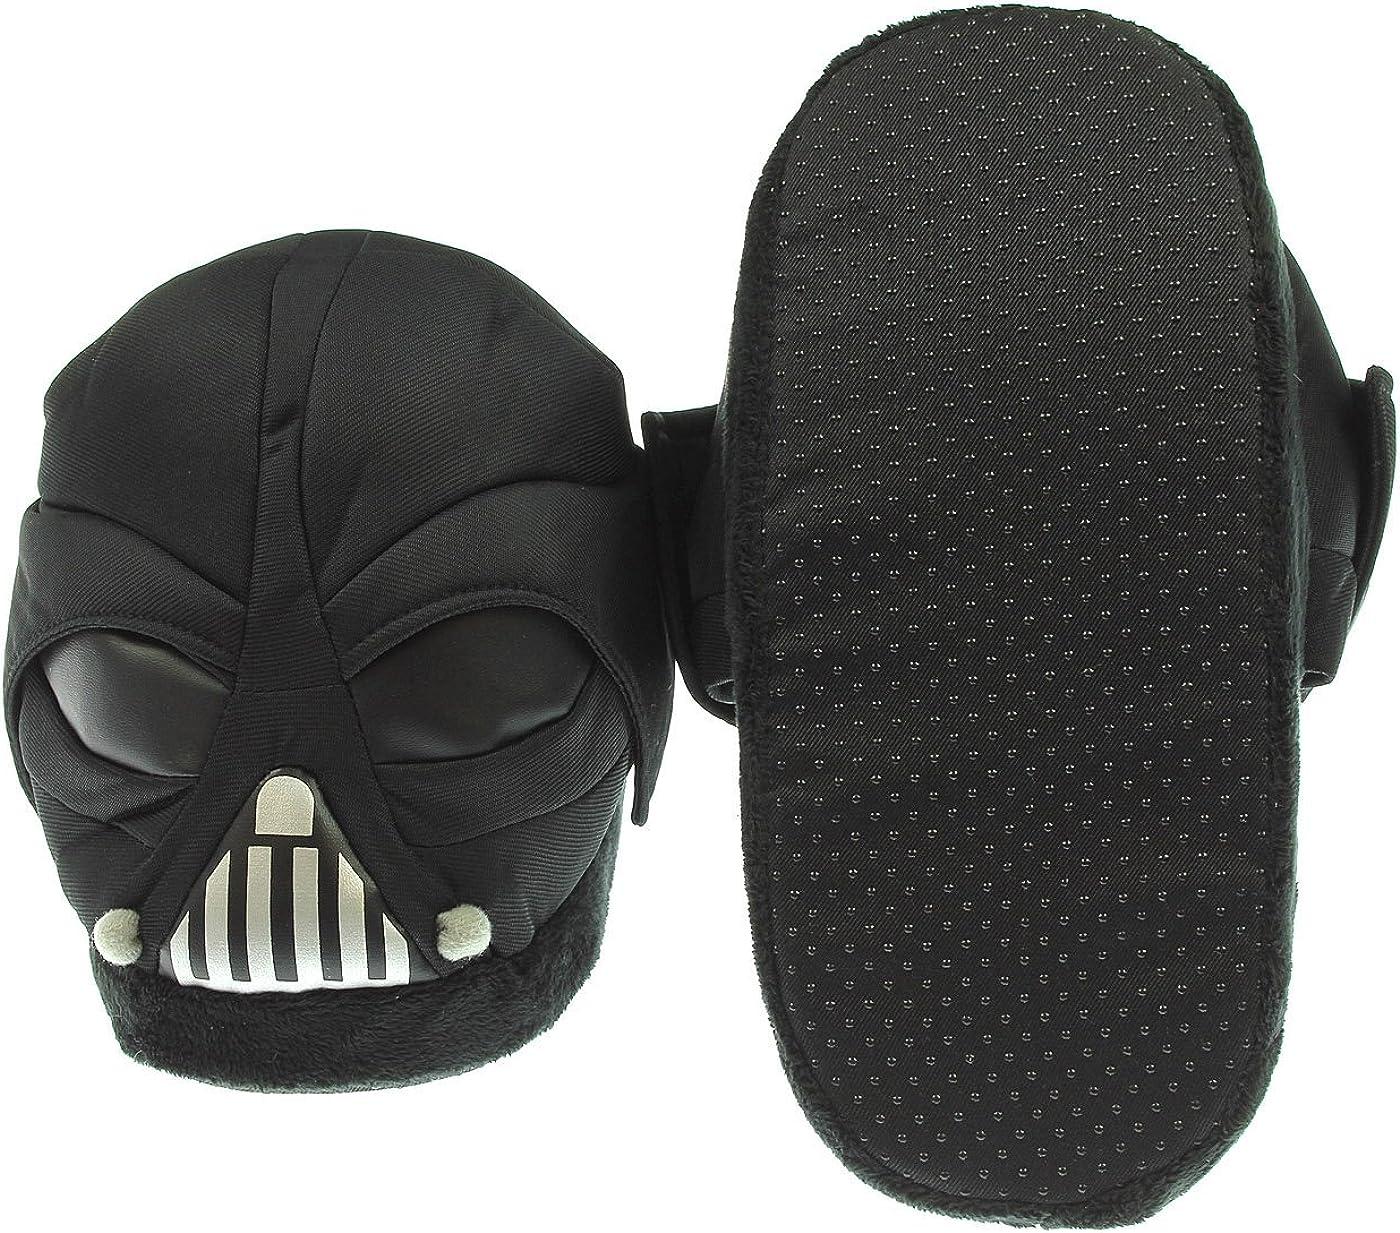 Star Wars Darth Vader 3D Plush Slippers New BIOWORLD